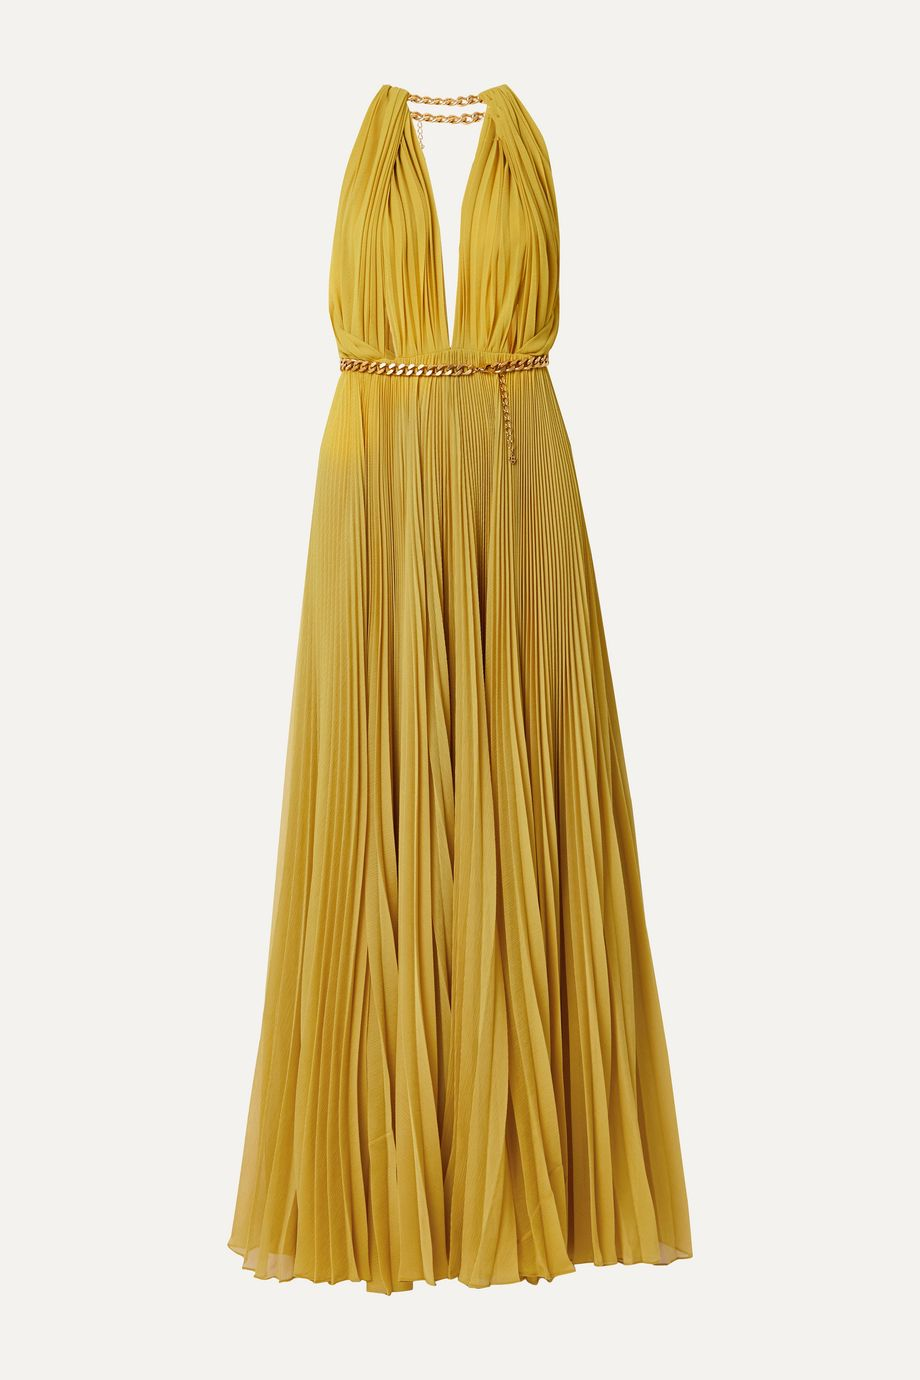 Oscar de la Renta Chain-embellished pleated silk-chiffon gown